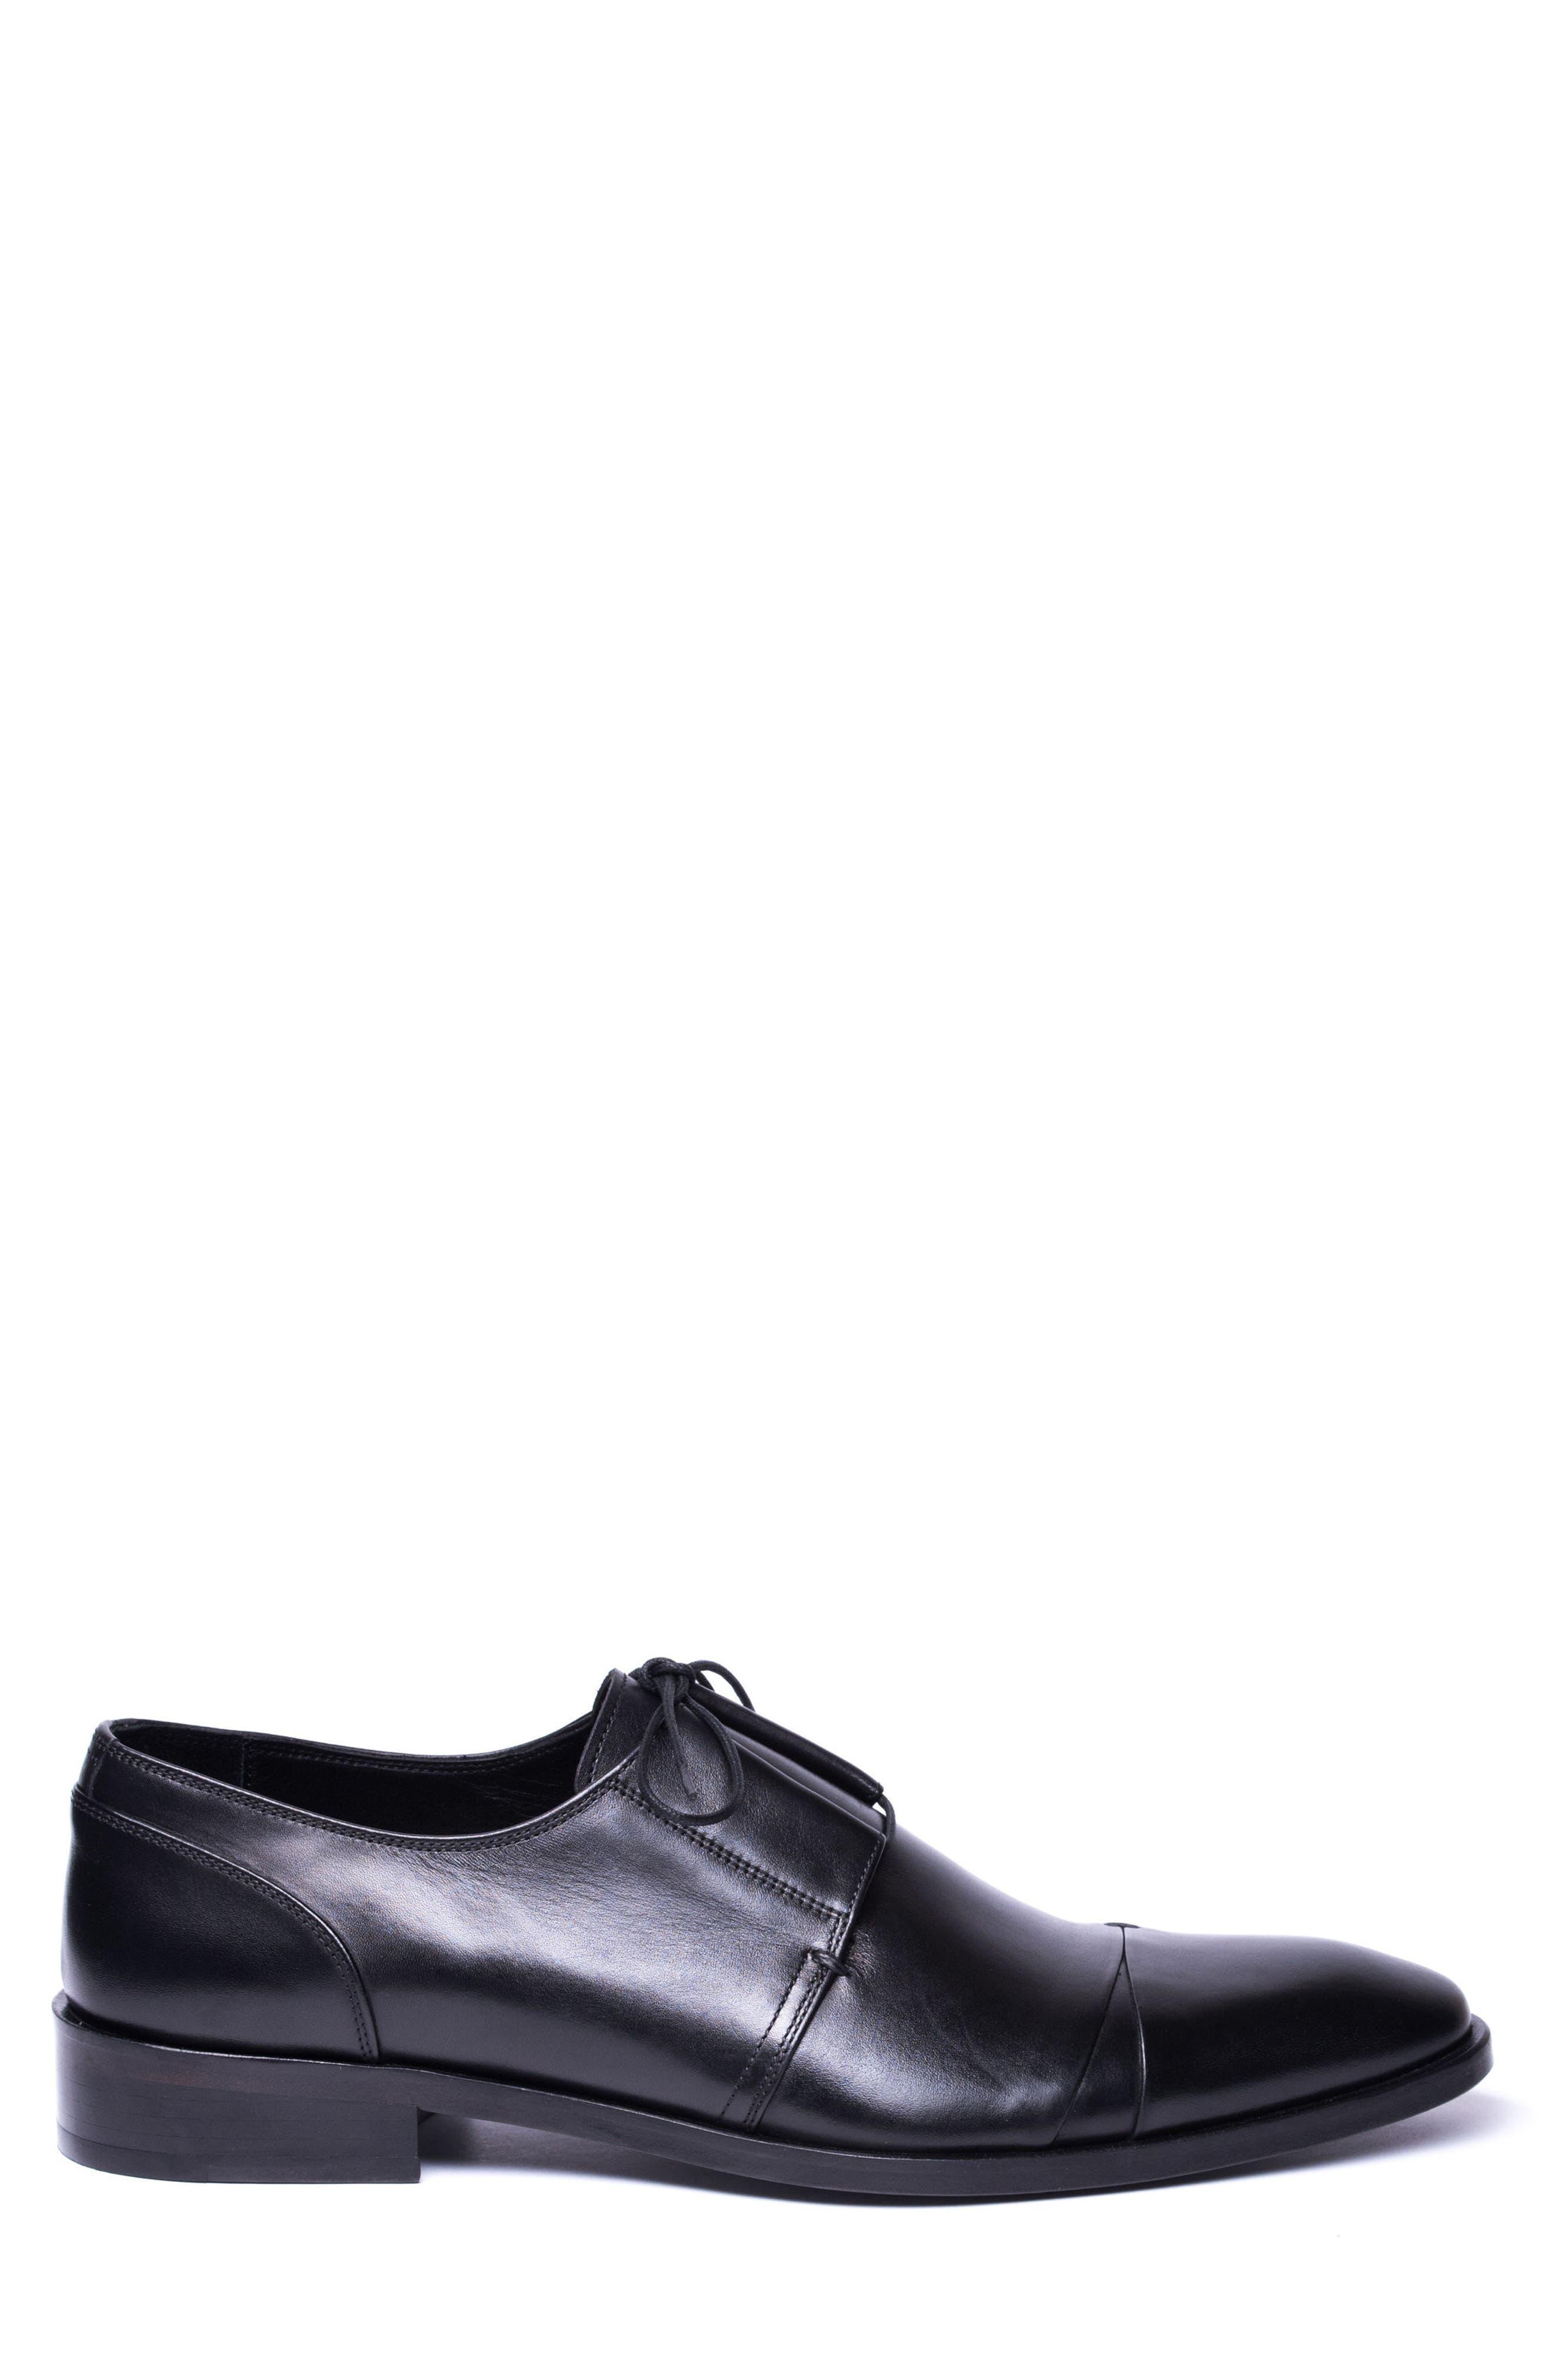 Danny Cap Toe Derby,                             Alternate thumbnail 3, color,                             Black Leather